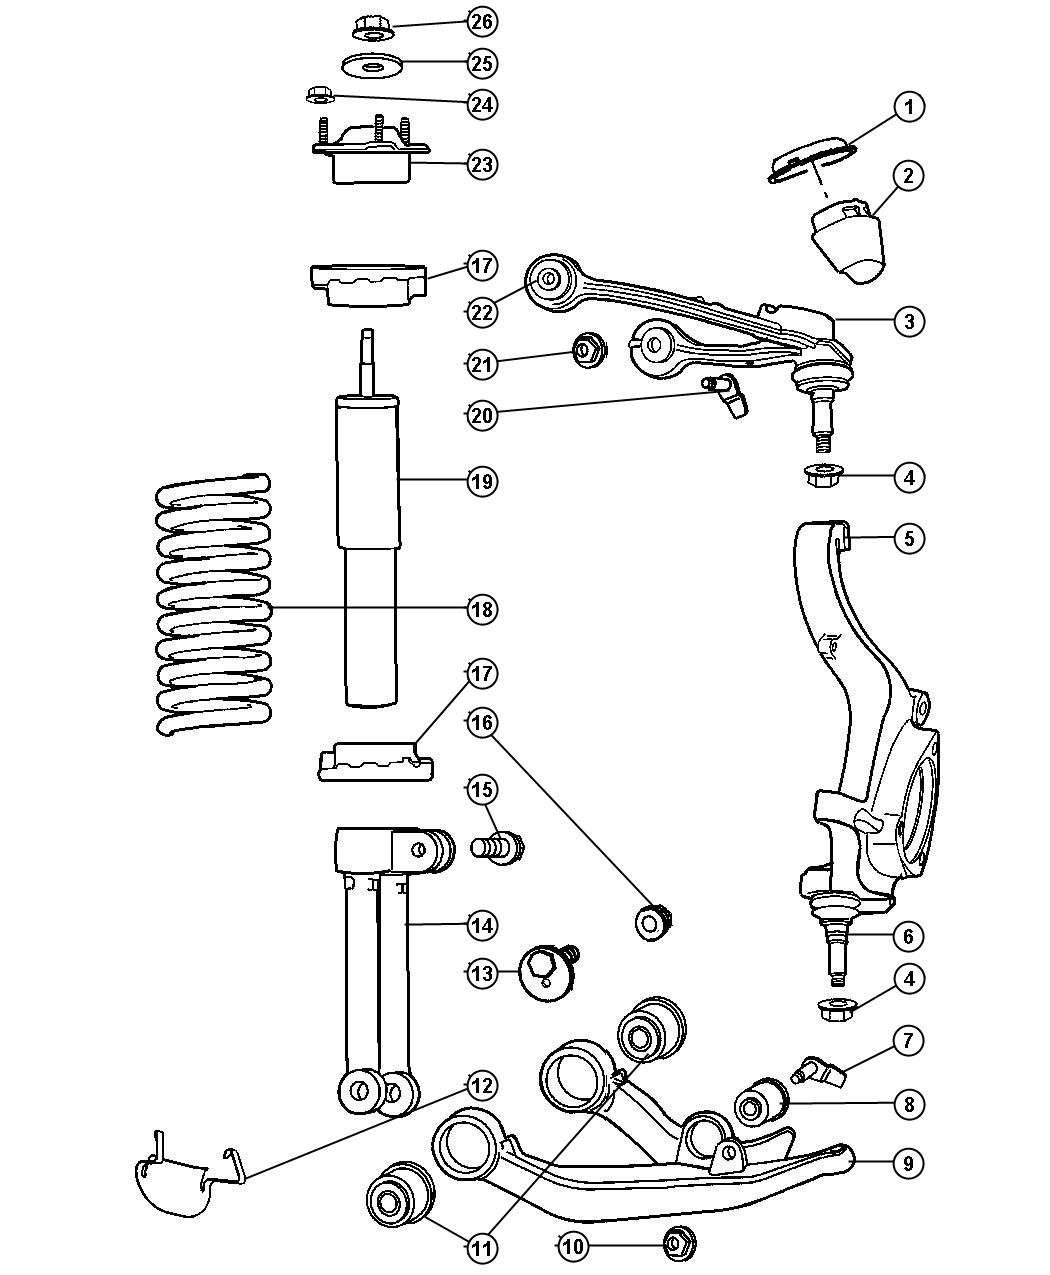 Chrysler Pt Cruiser Bushing Control Arm Upper Front